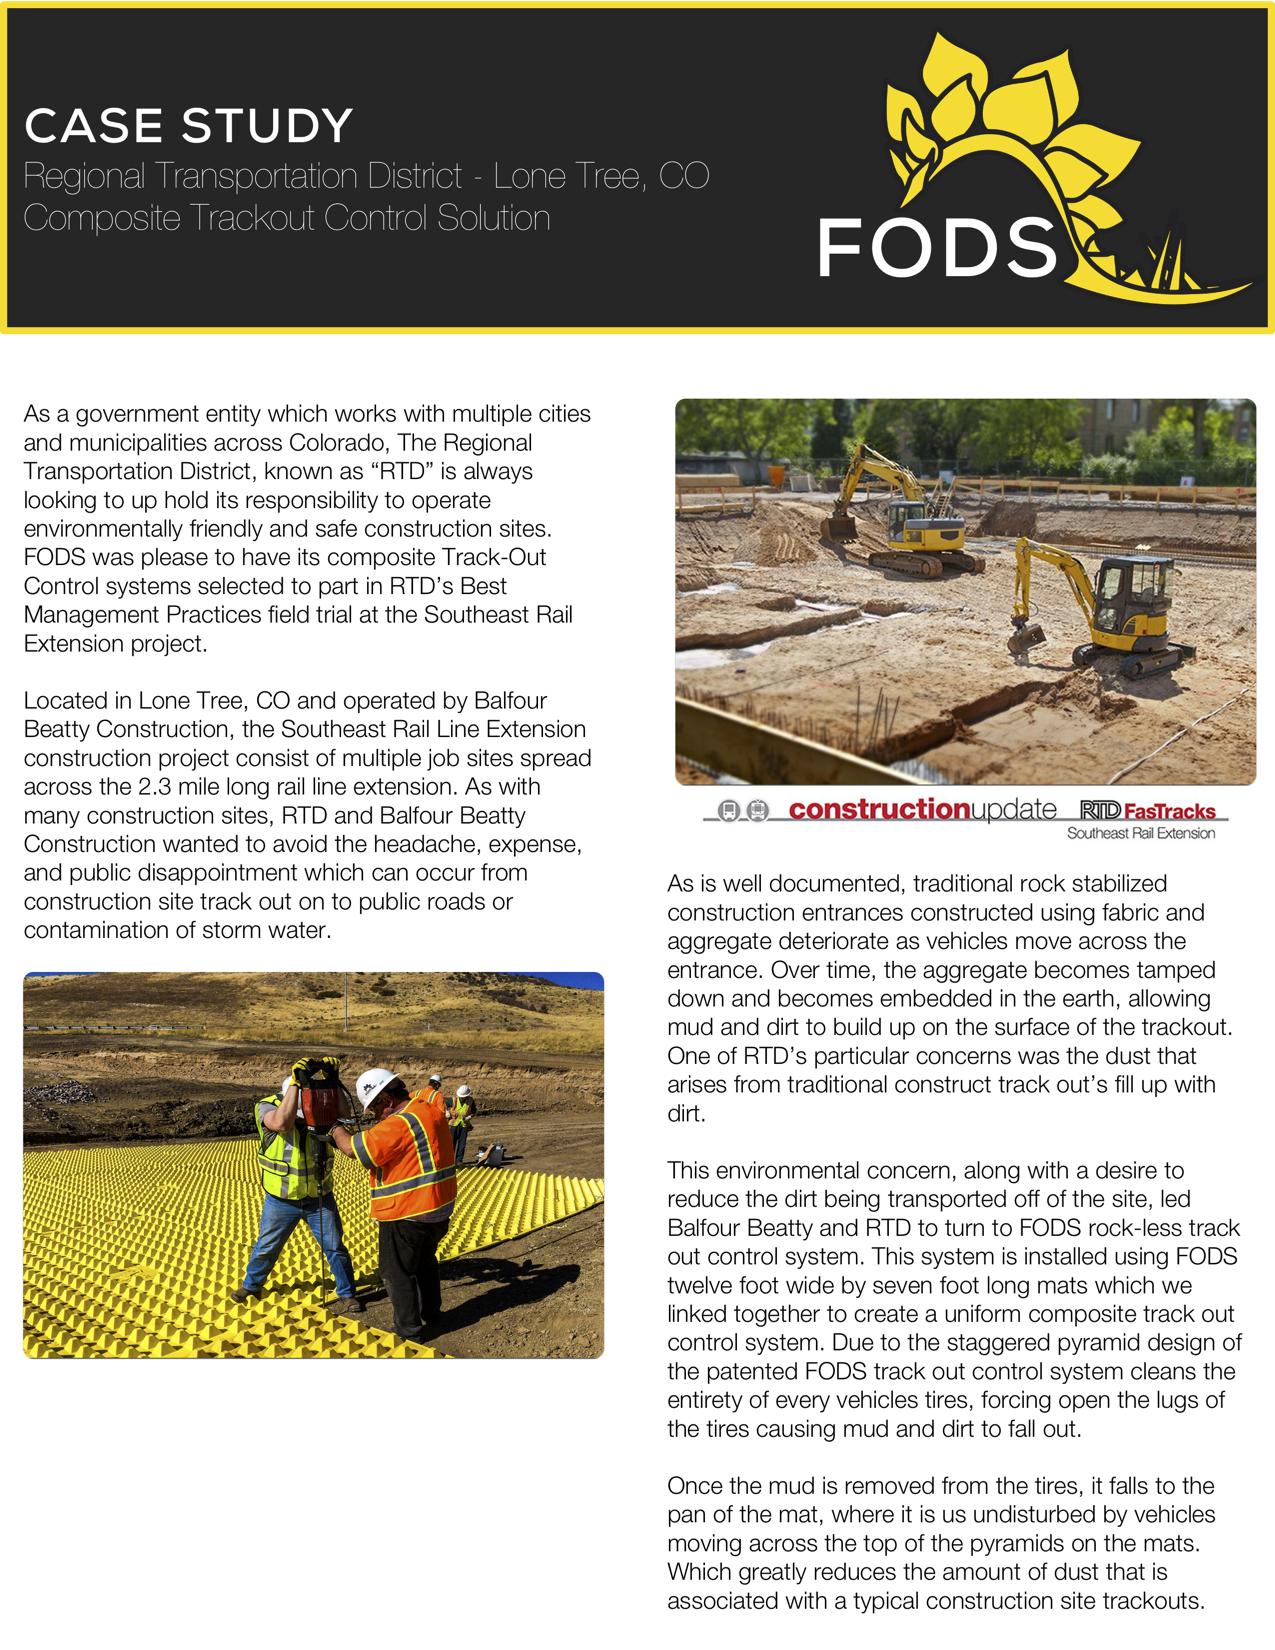 FODS_Case_RTD.jpg